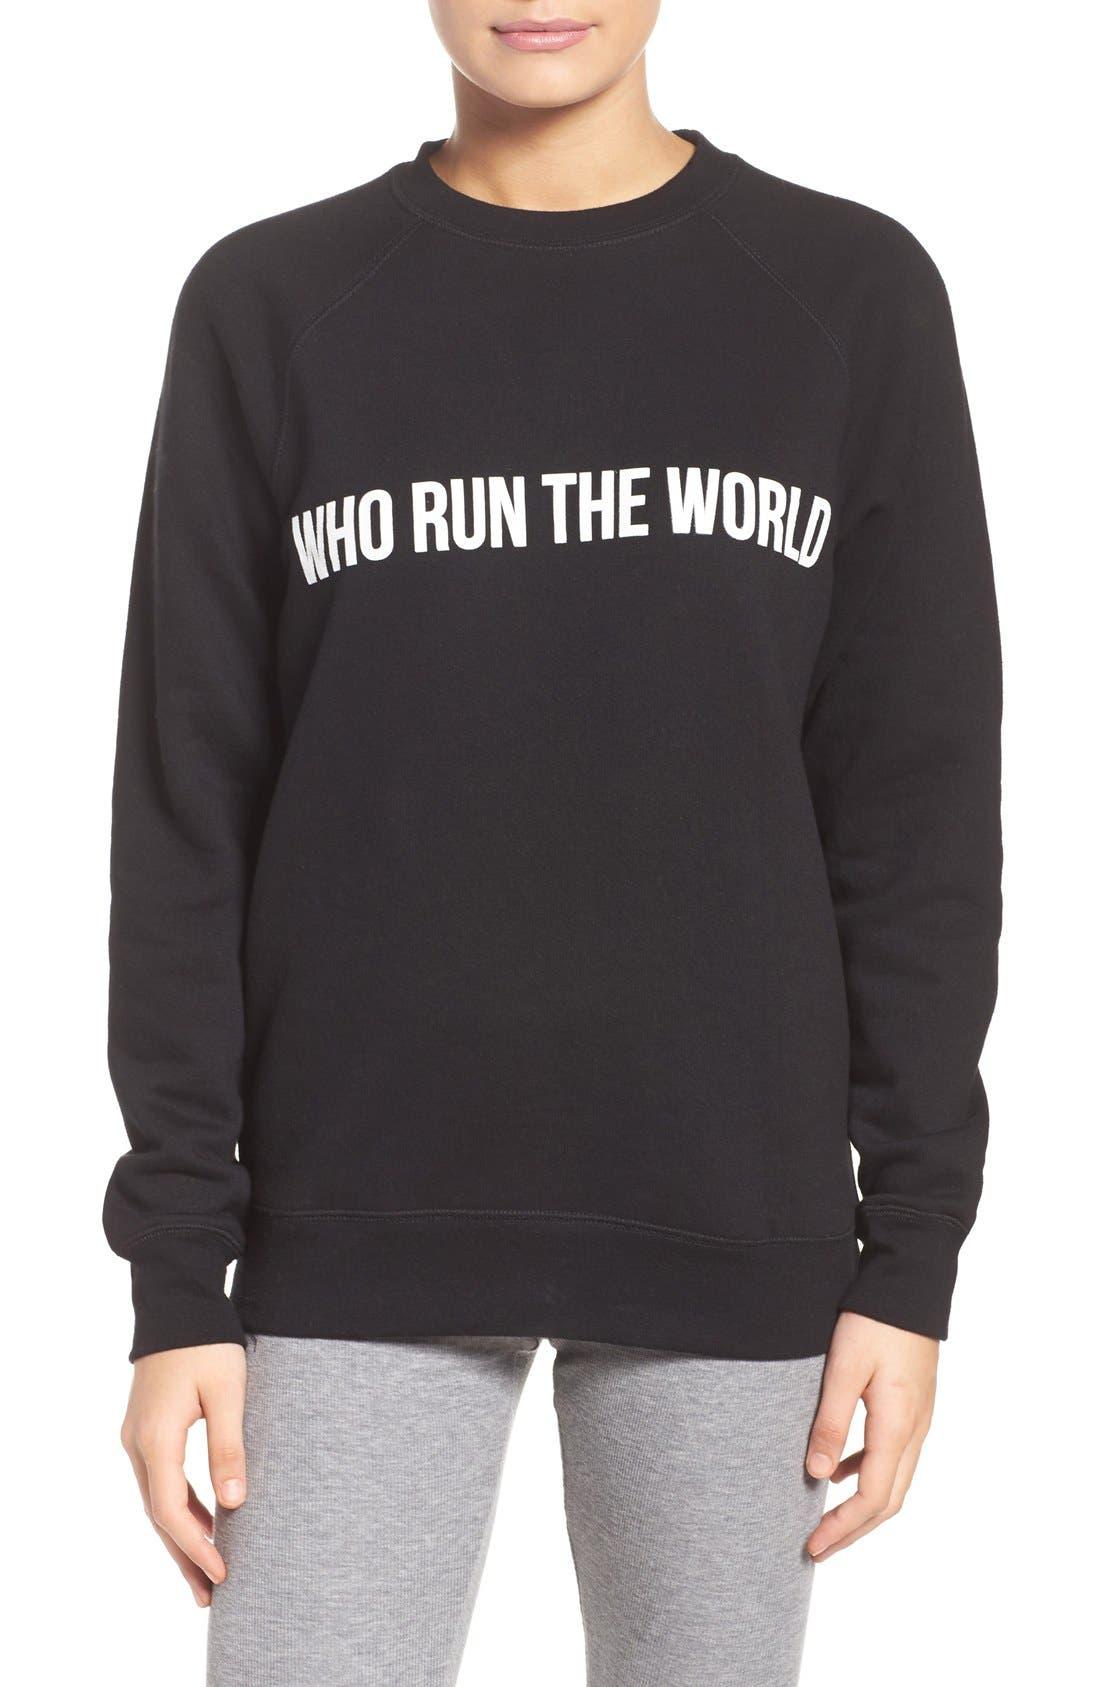 Who Run the World Sweatshirt,                             Main thumbnail 1, color,